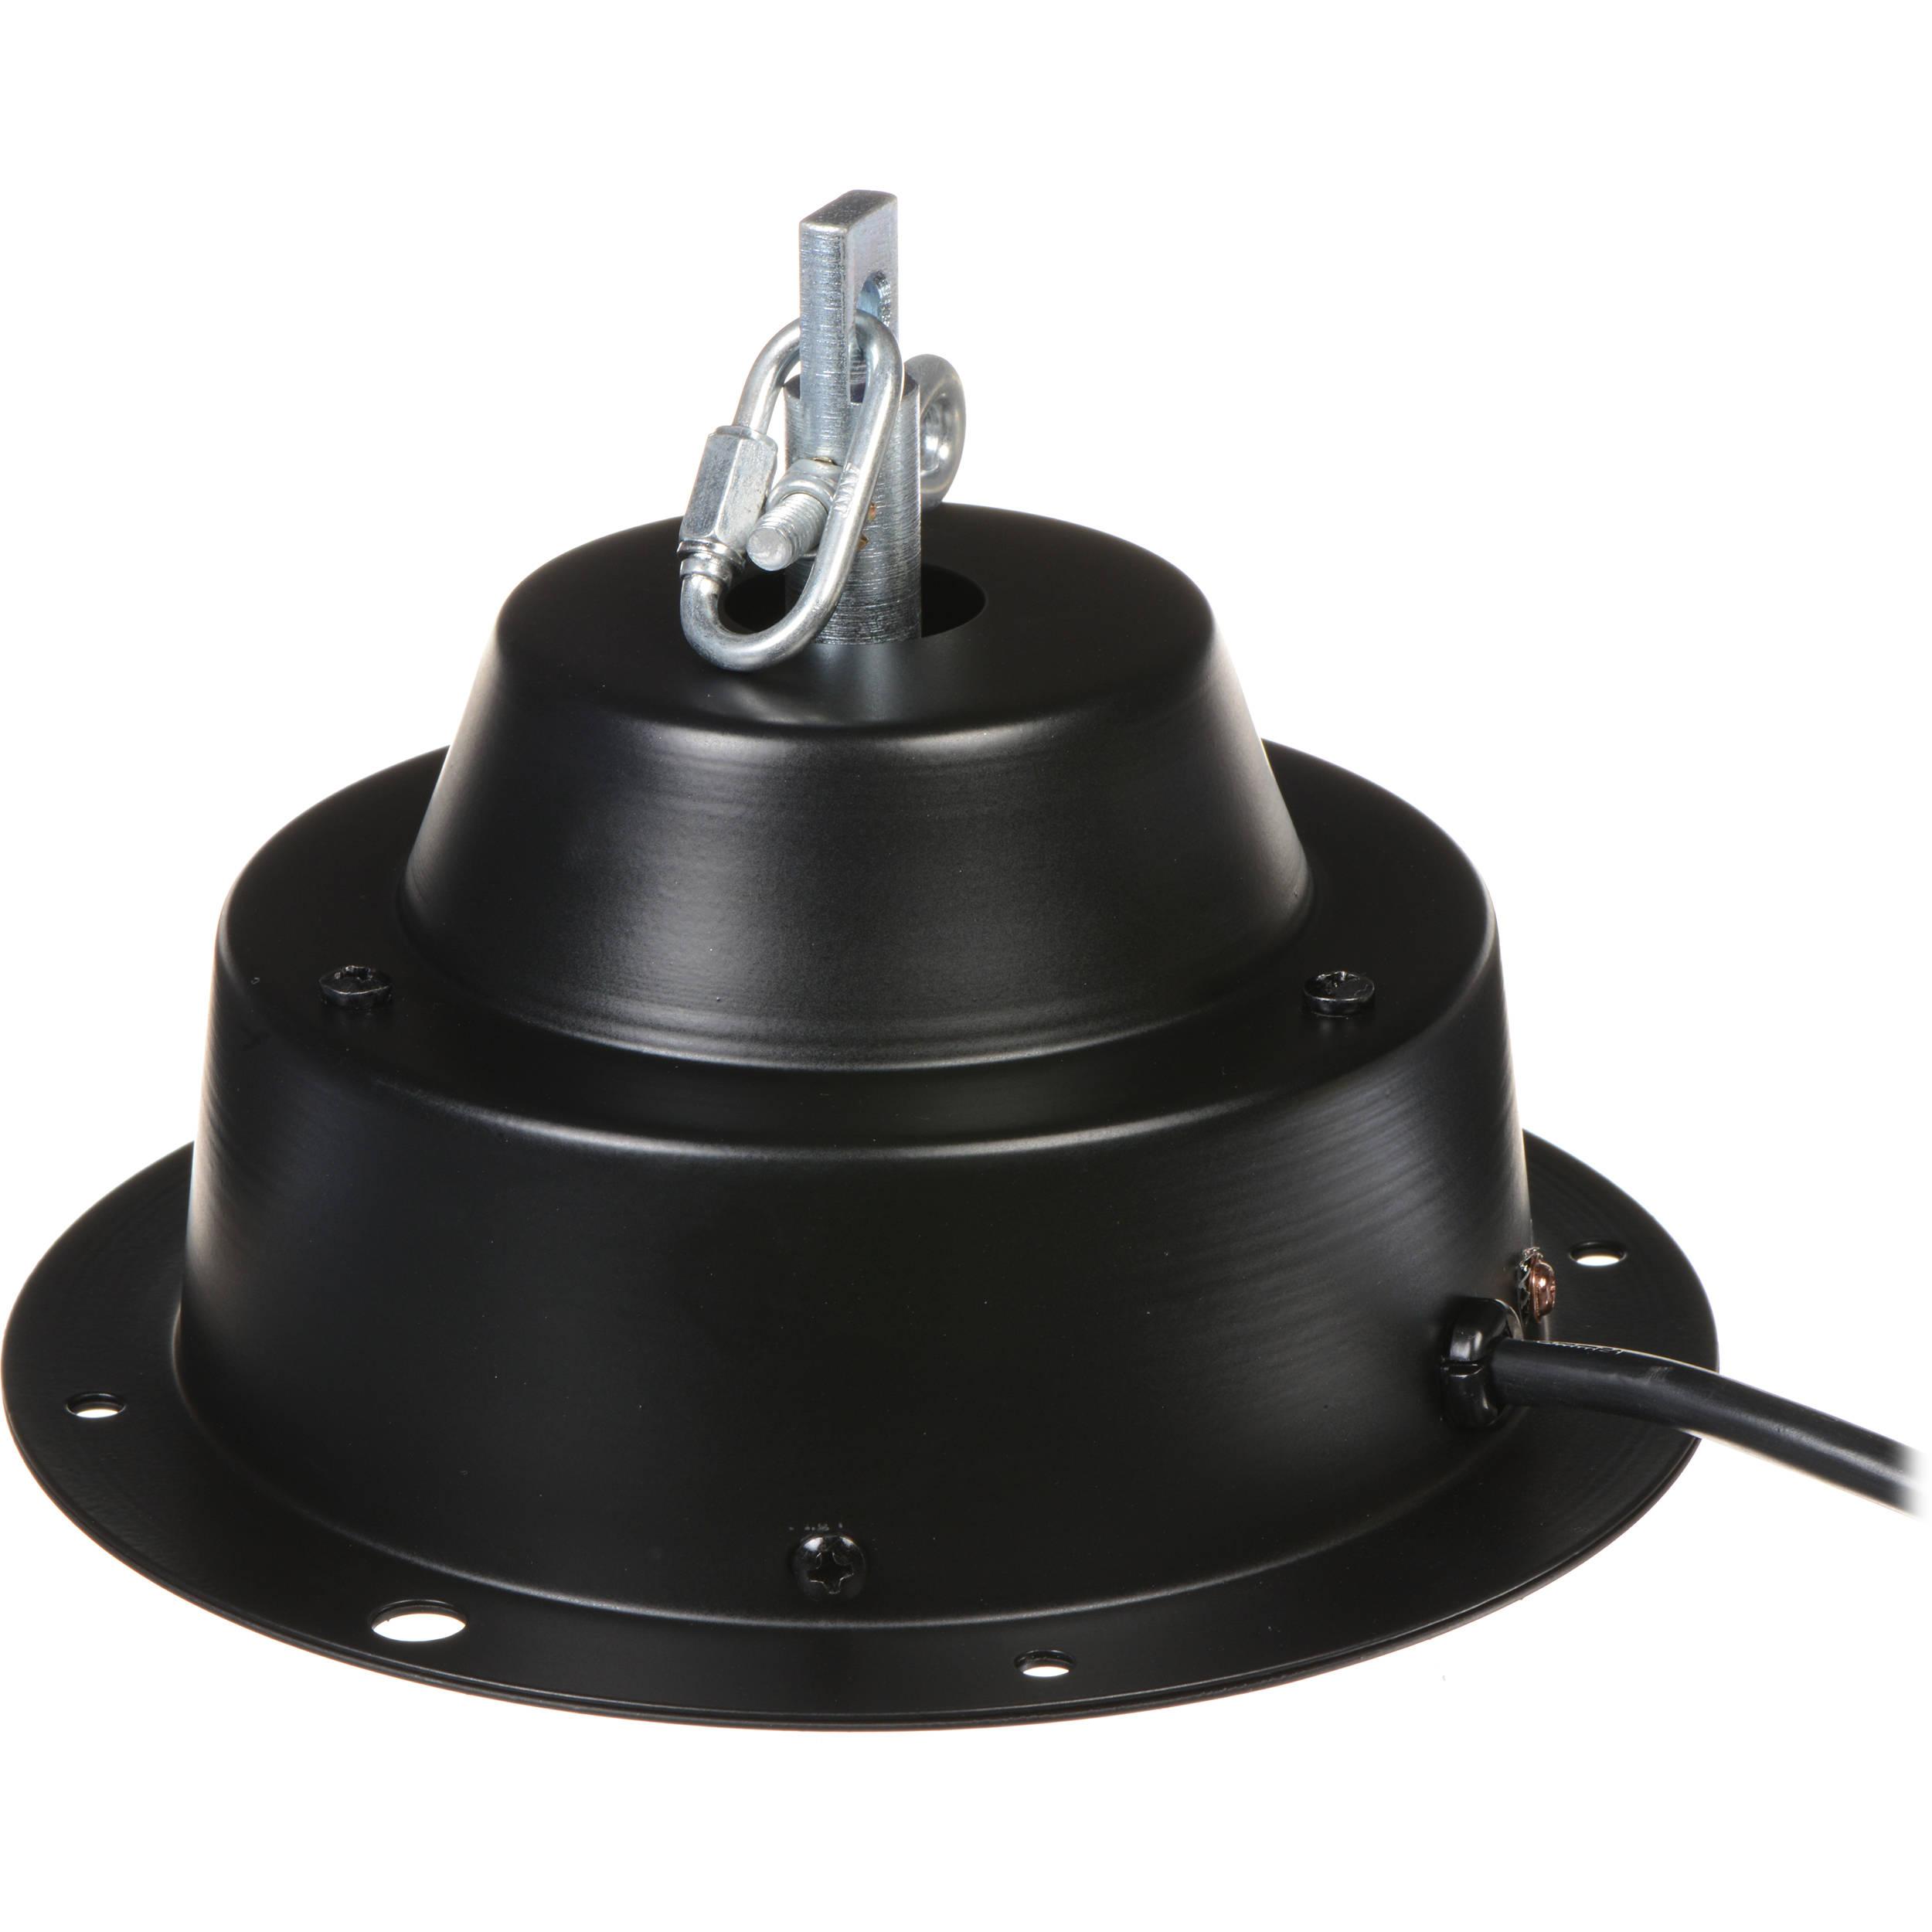 American dj m 103hd heavy duty 3 rpm mirror ball motor m 103hd for Disco ball motor heavy duty